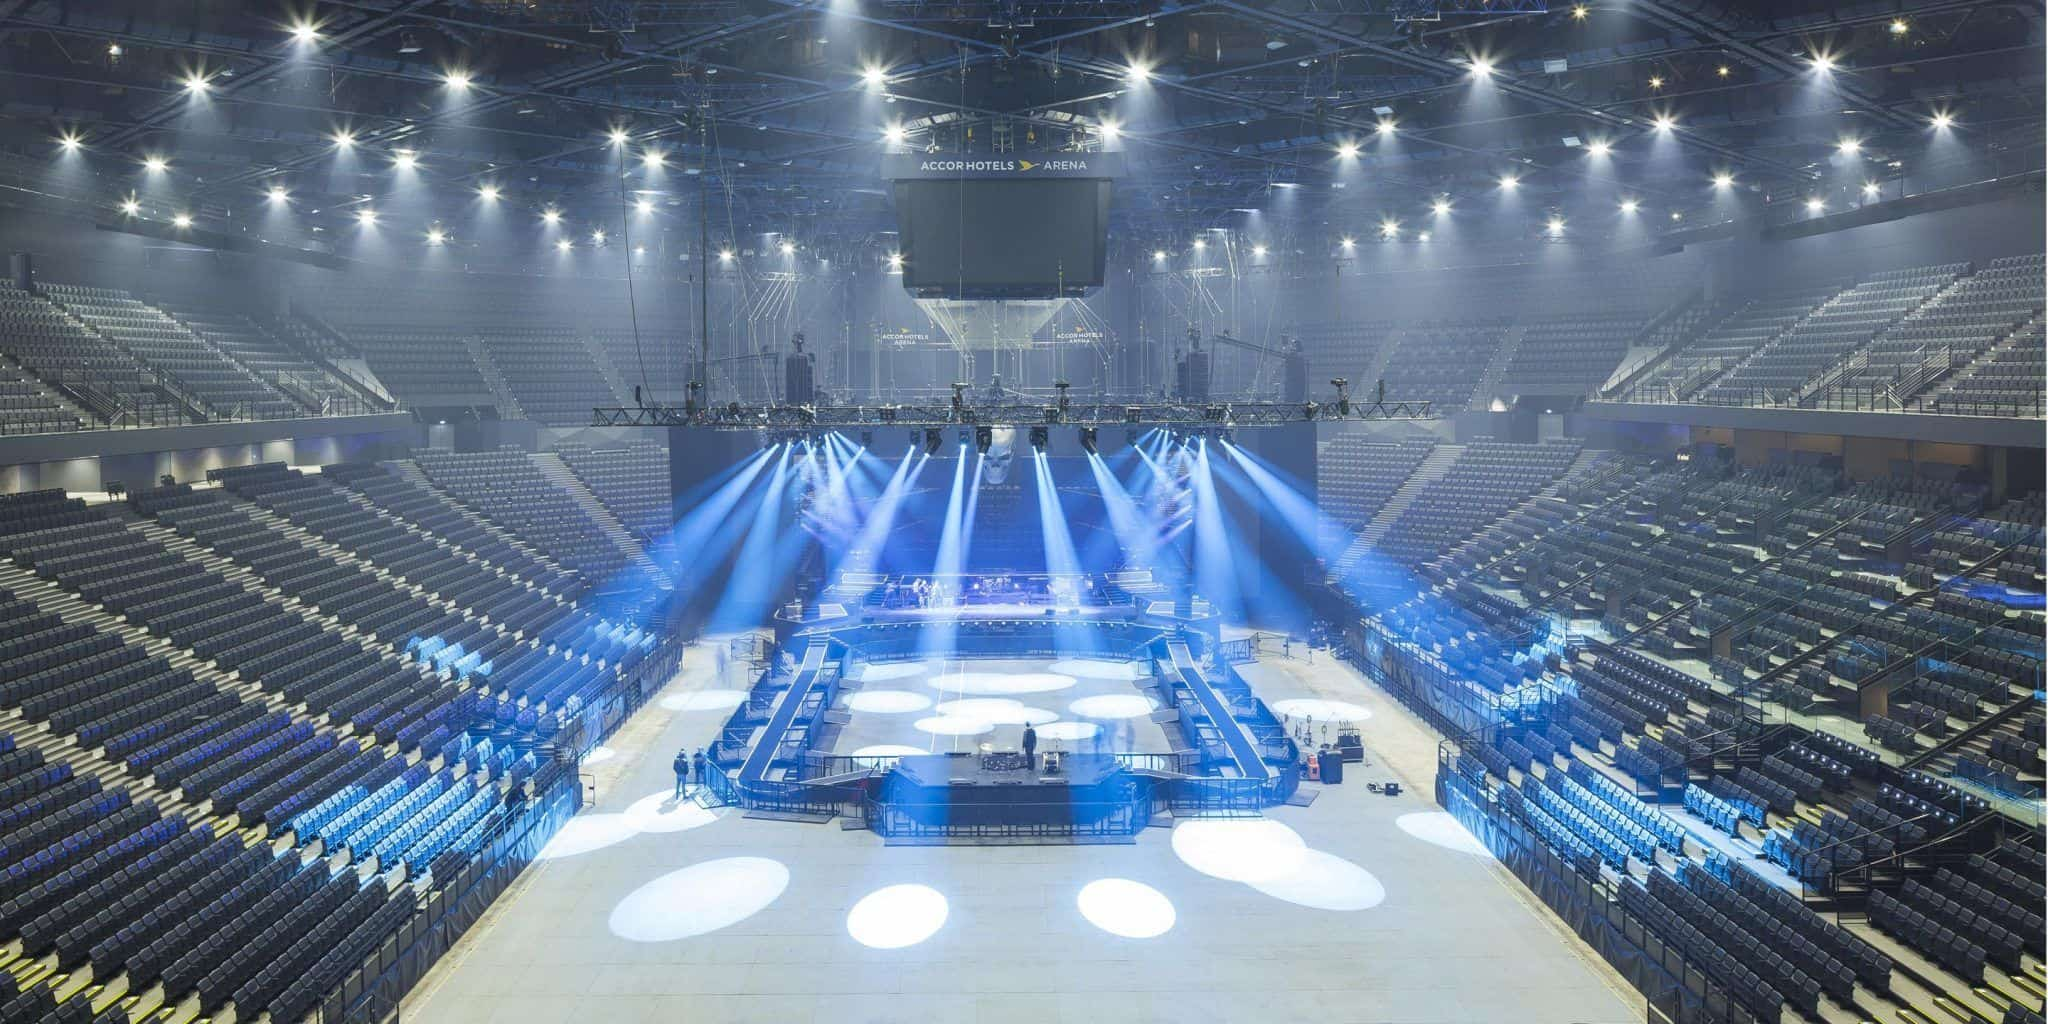 AccorHotels Arena - DVVD